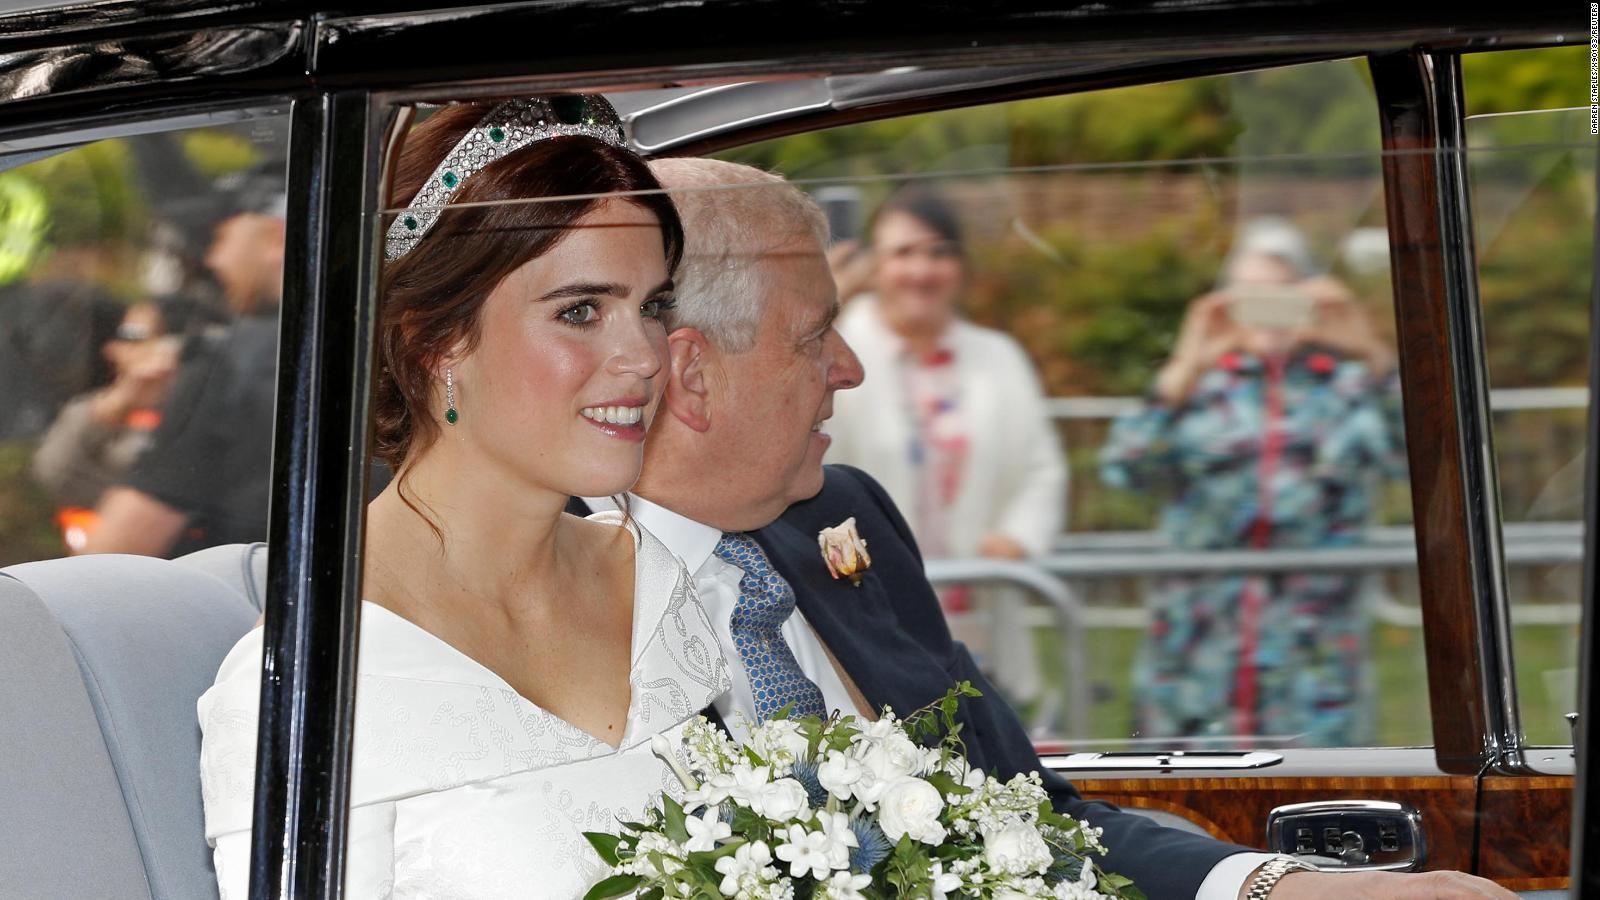 74eeb29369b6 Princess Eugenie makes bold statement with wedding dress revealing scars -  CNN Style